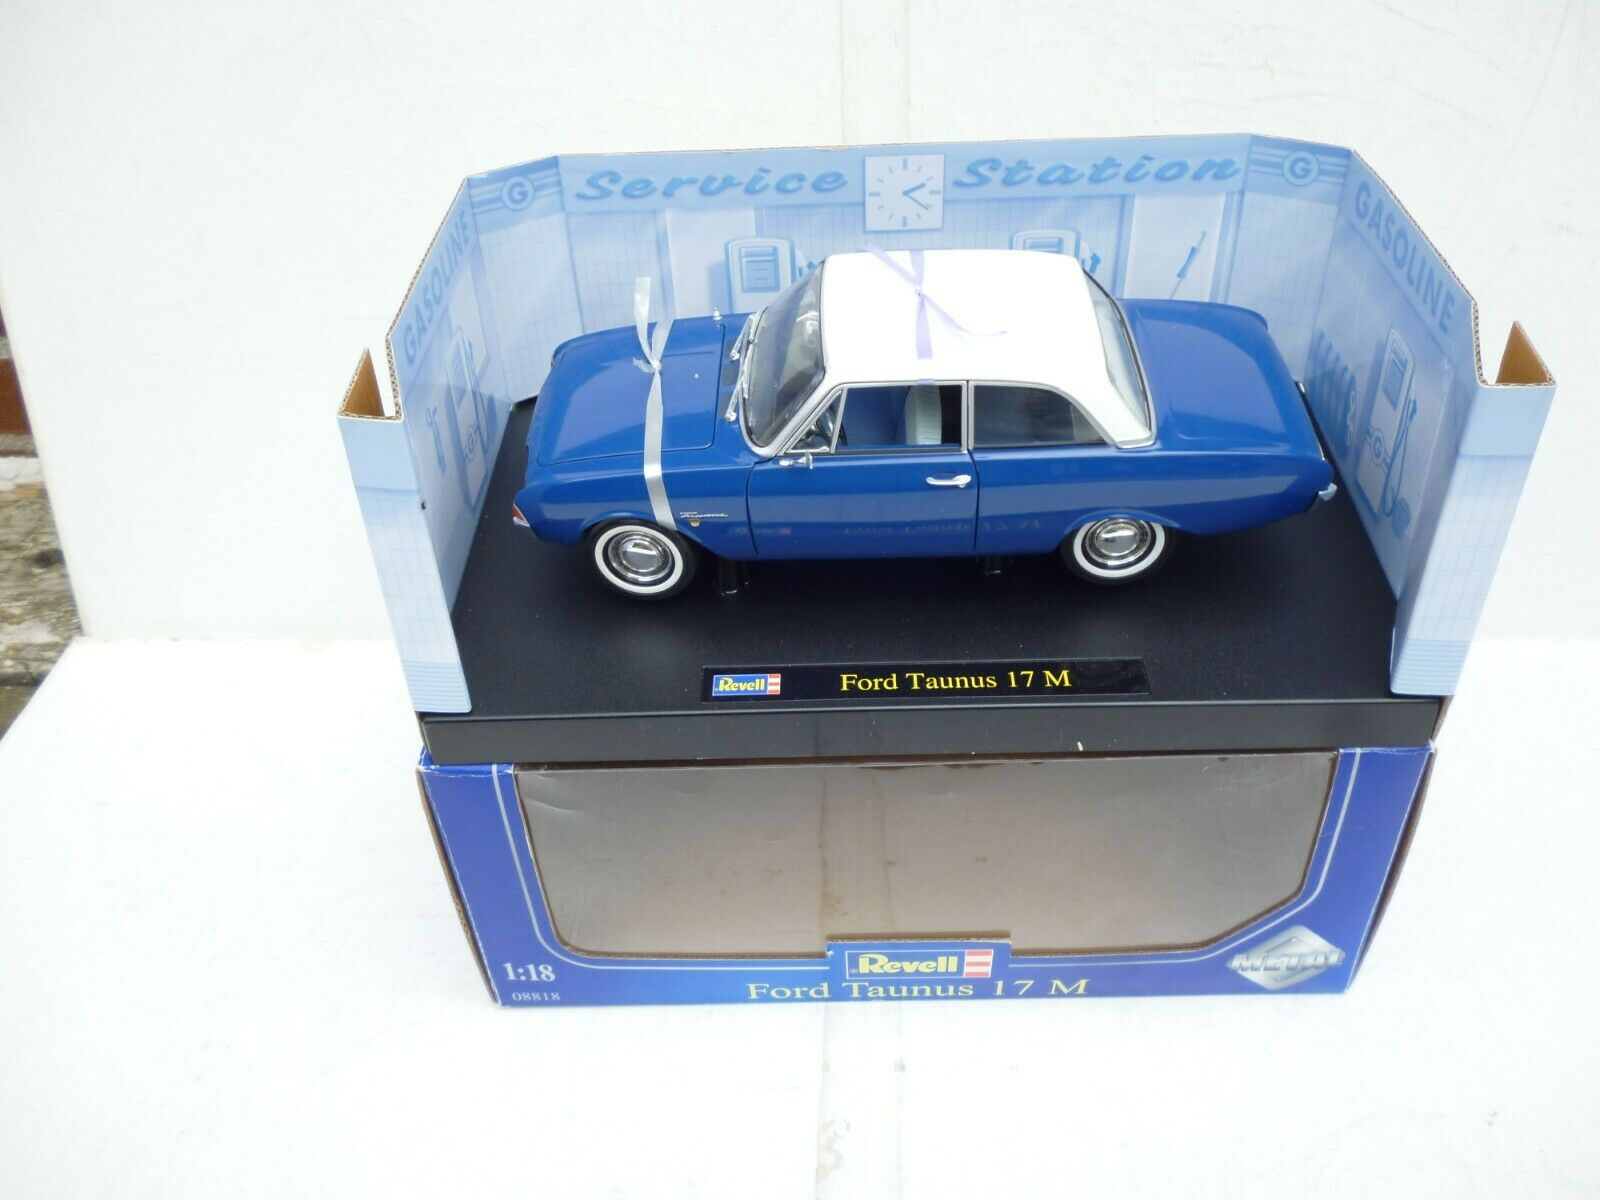 Revell 1 18 Scale diecast - 08818 Ford  Taunus 17M    Brand nouveau    in ovp Rare  achats de mode en ligne